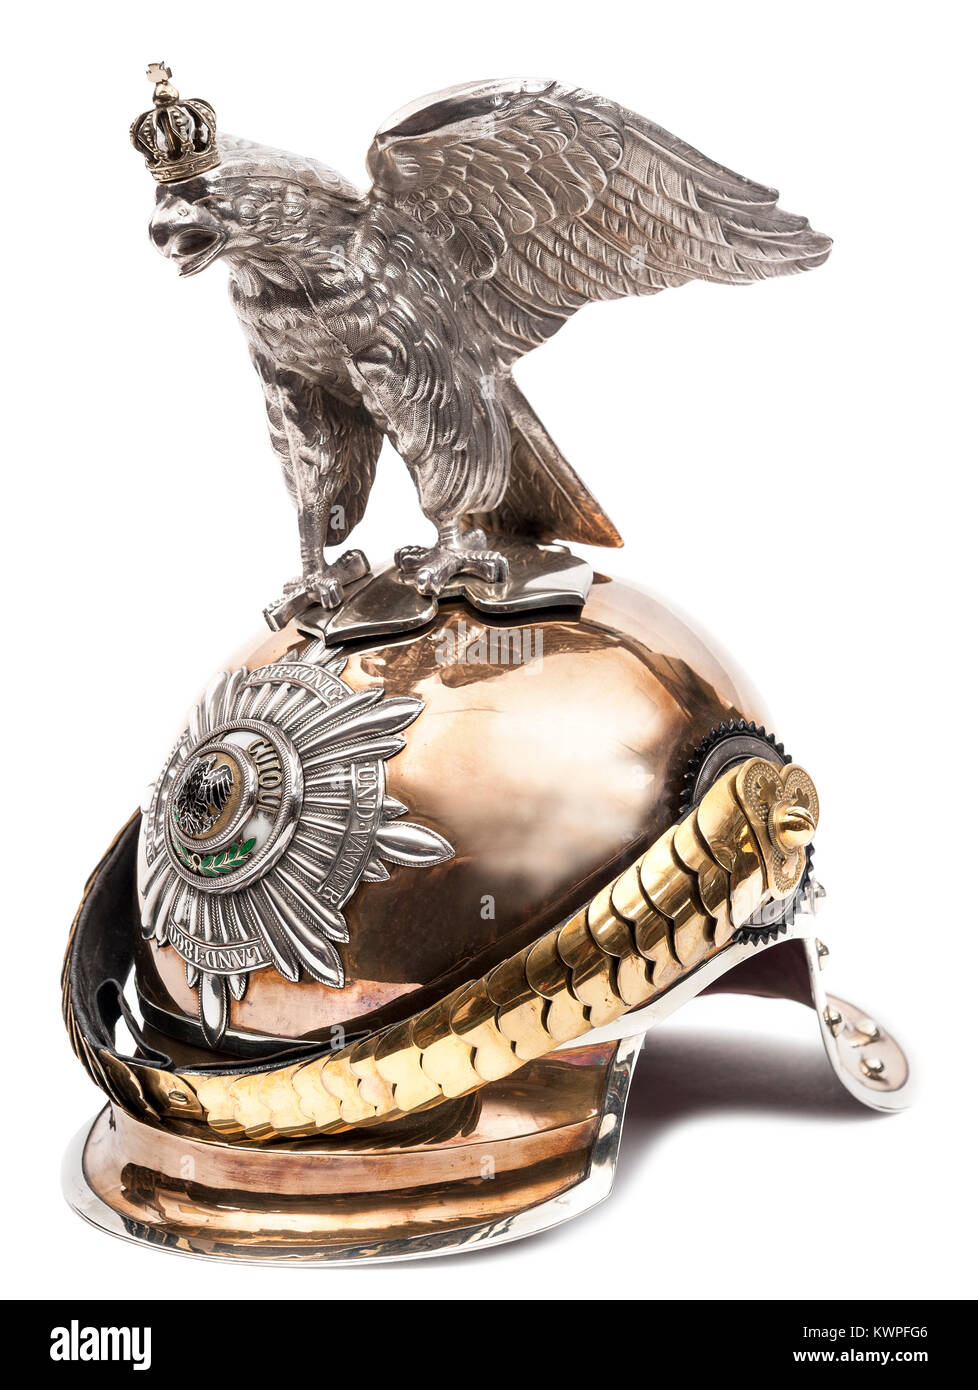 Officer's Prussian M1899 helmet of the Garde du Corps or Garde Kurassiere Regiment - Stock Image